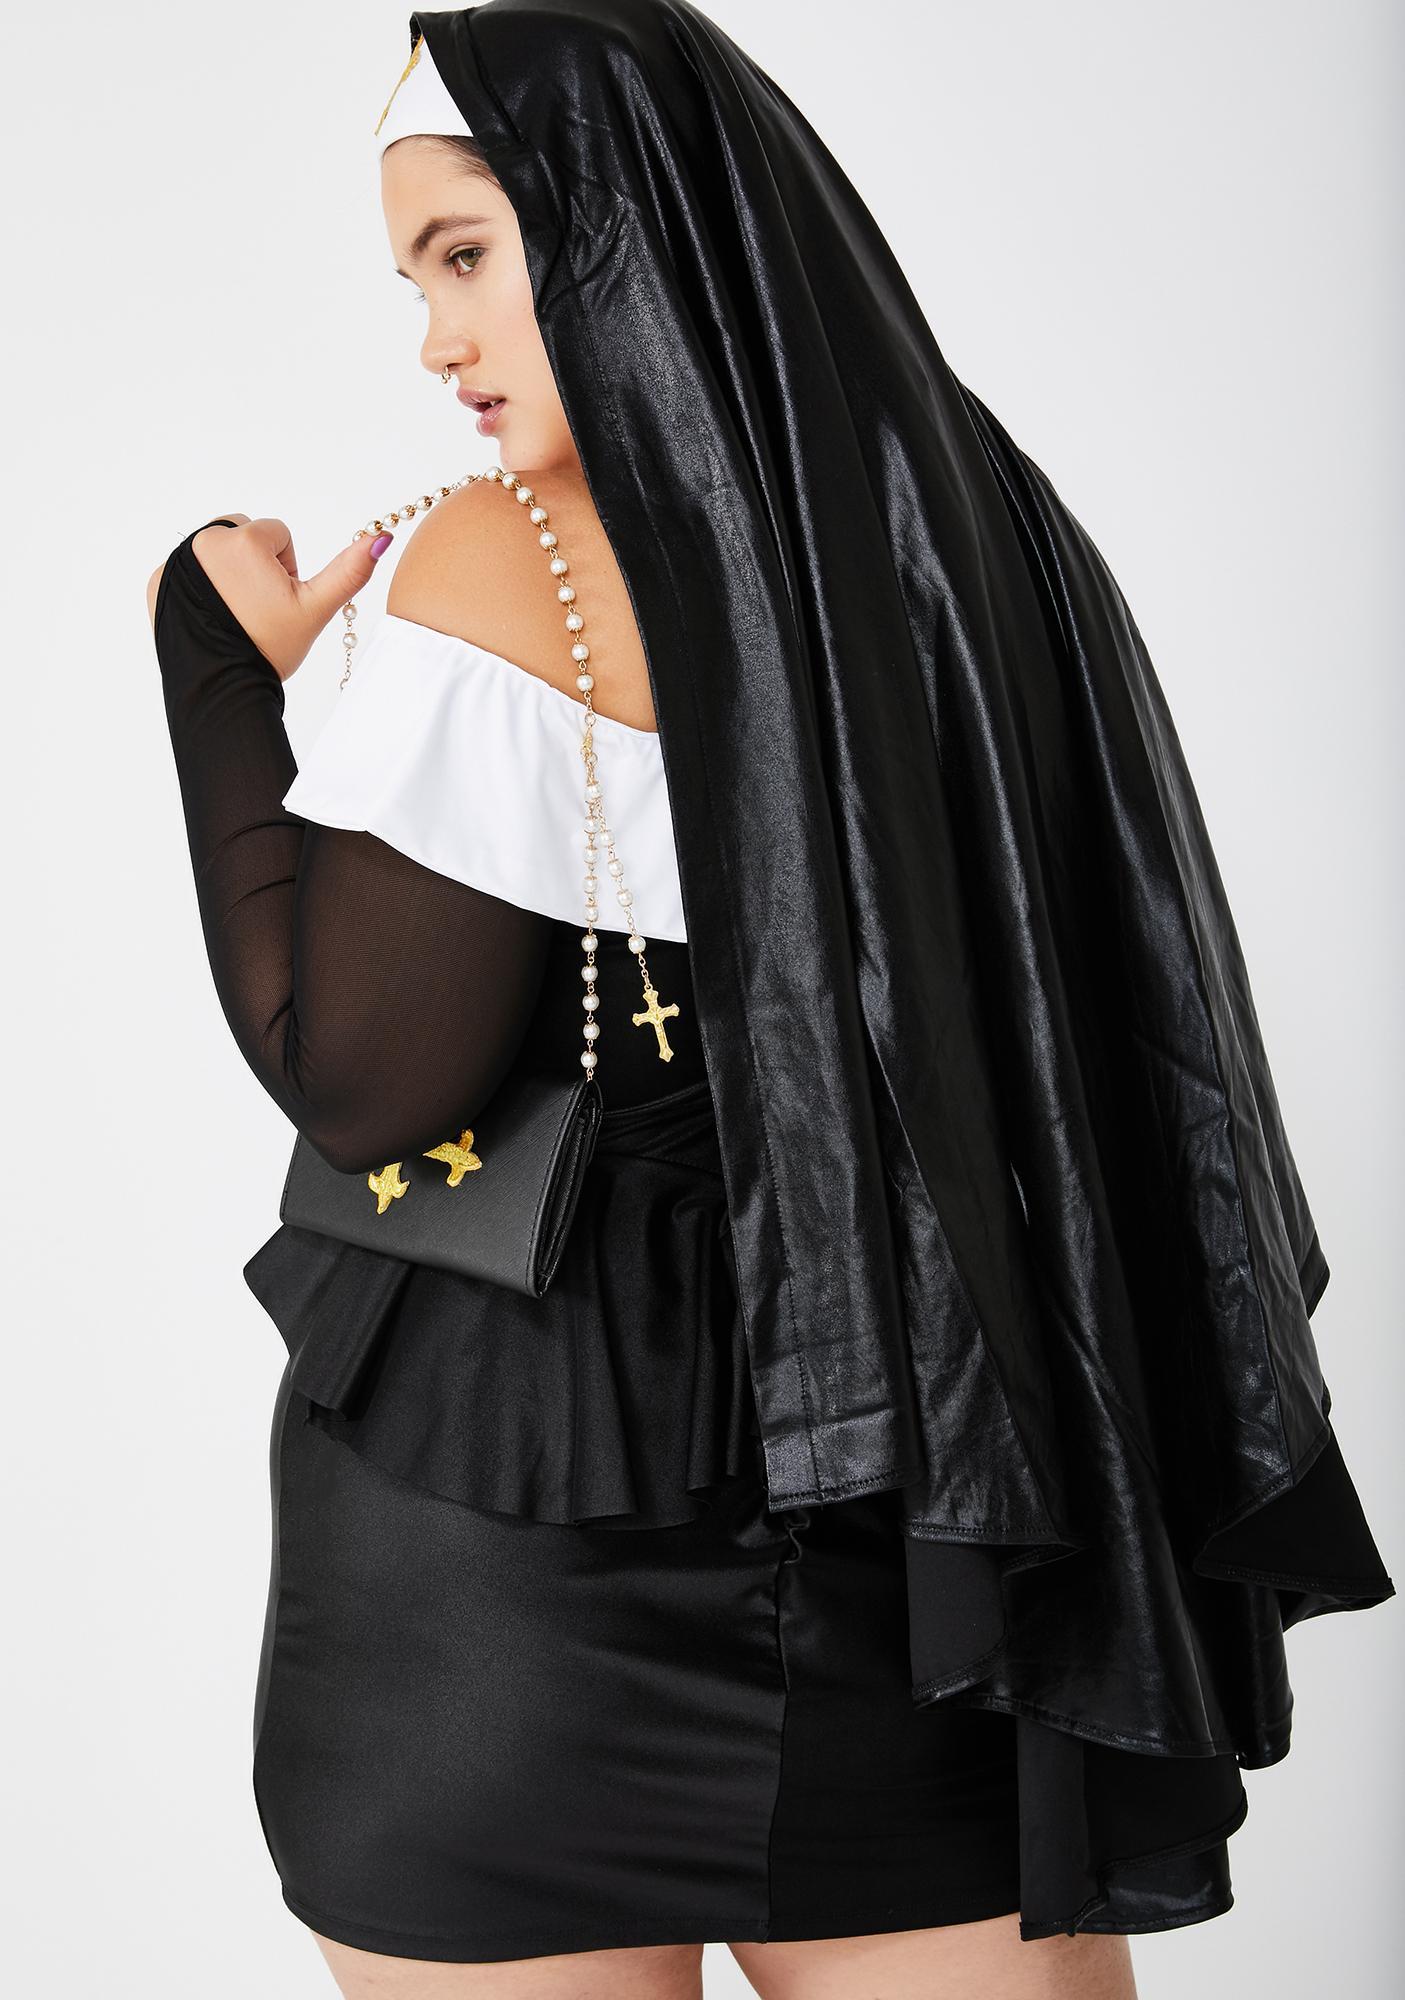 Sinners Anonymous Costume Set